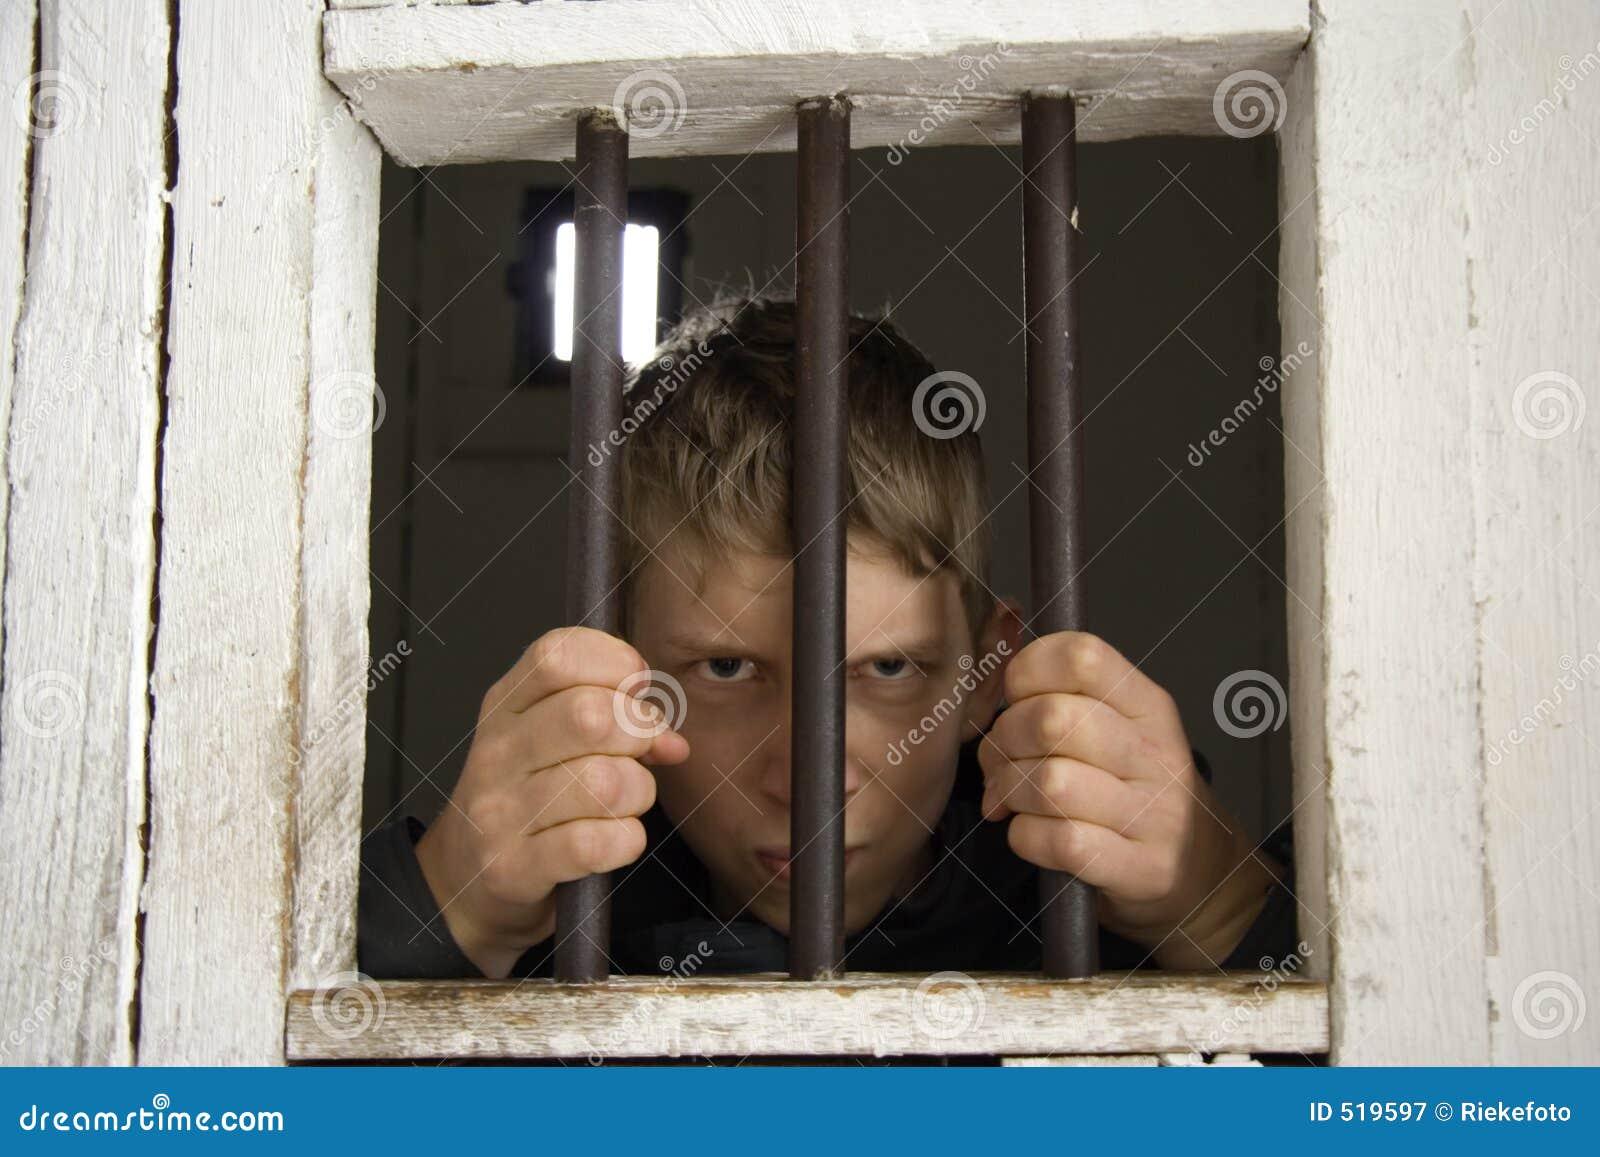 Rowdy behind ancient prison bars